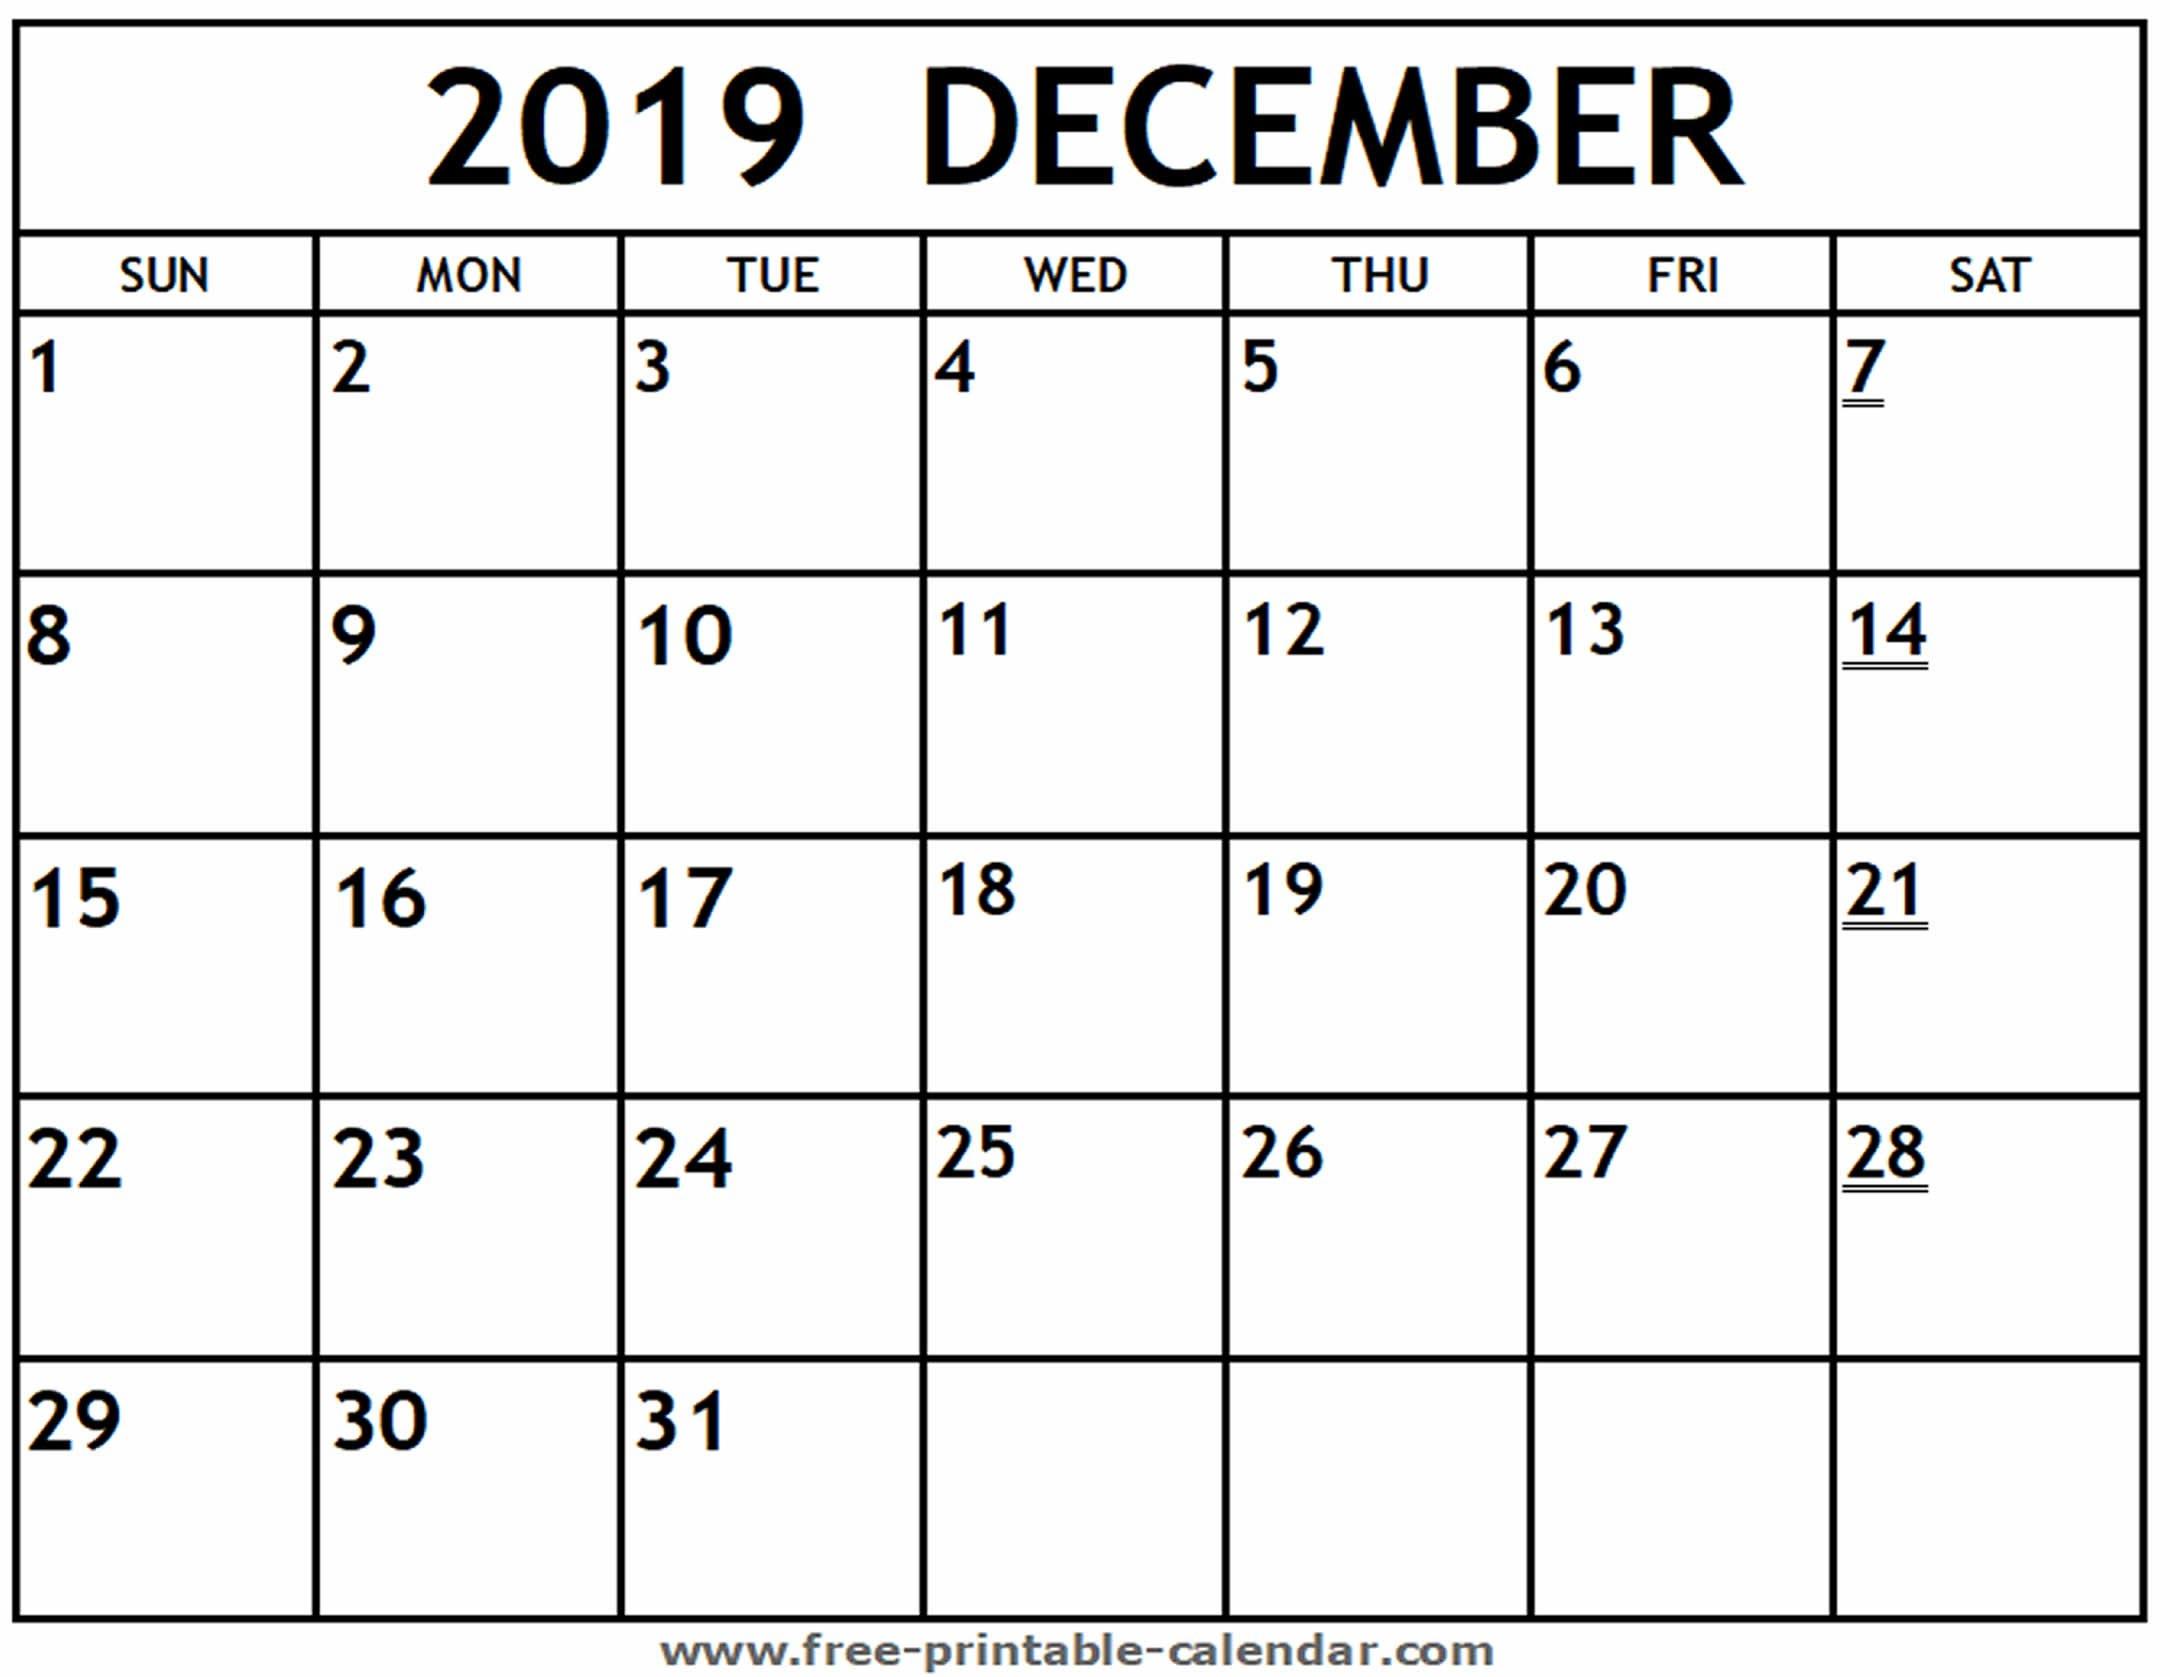 Printable 2019 December Calendar - Free-Printable-Calendar Calendar 2019 December Printable